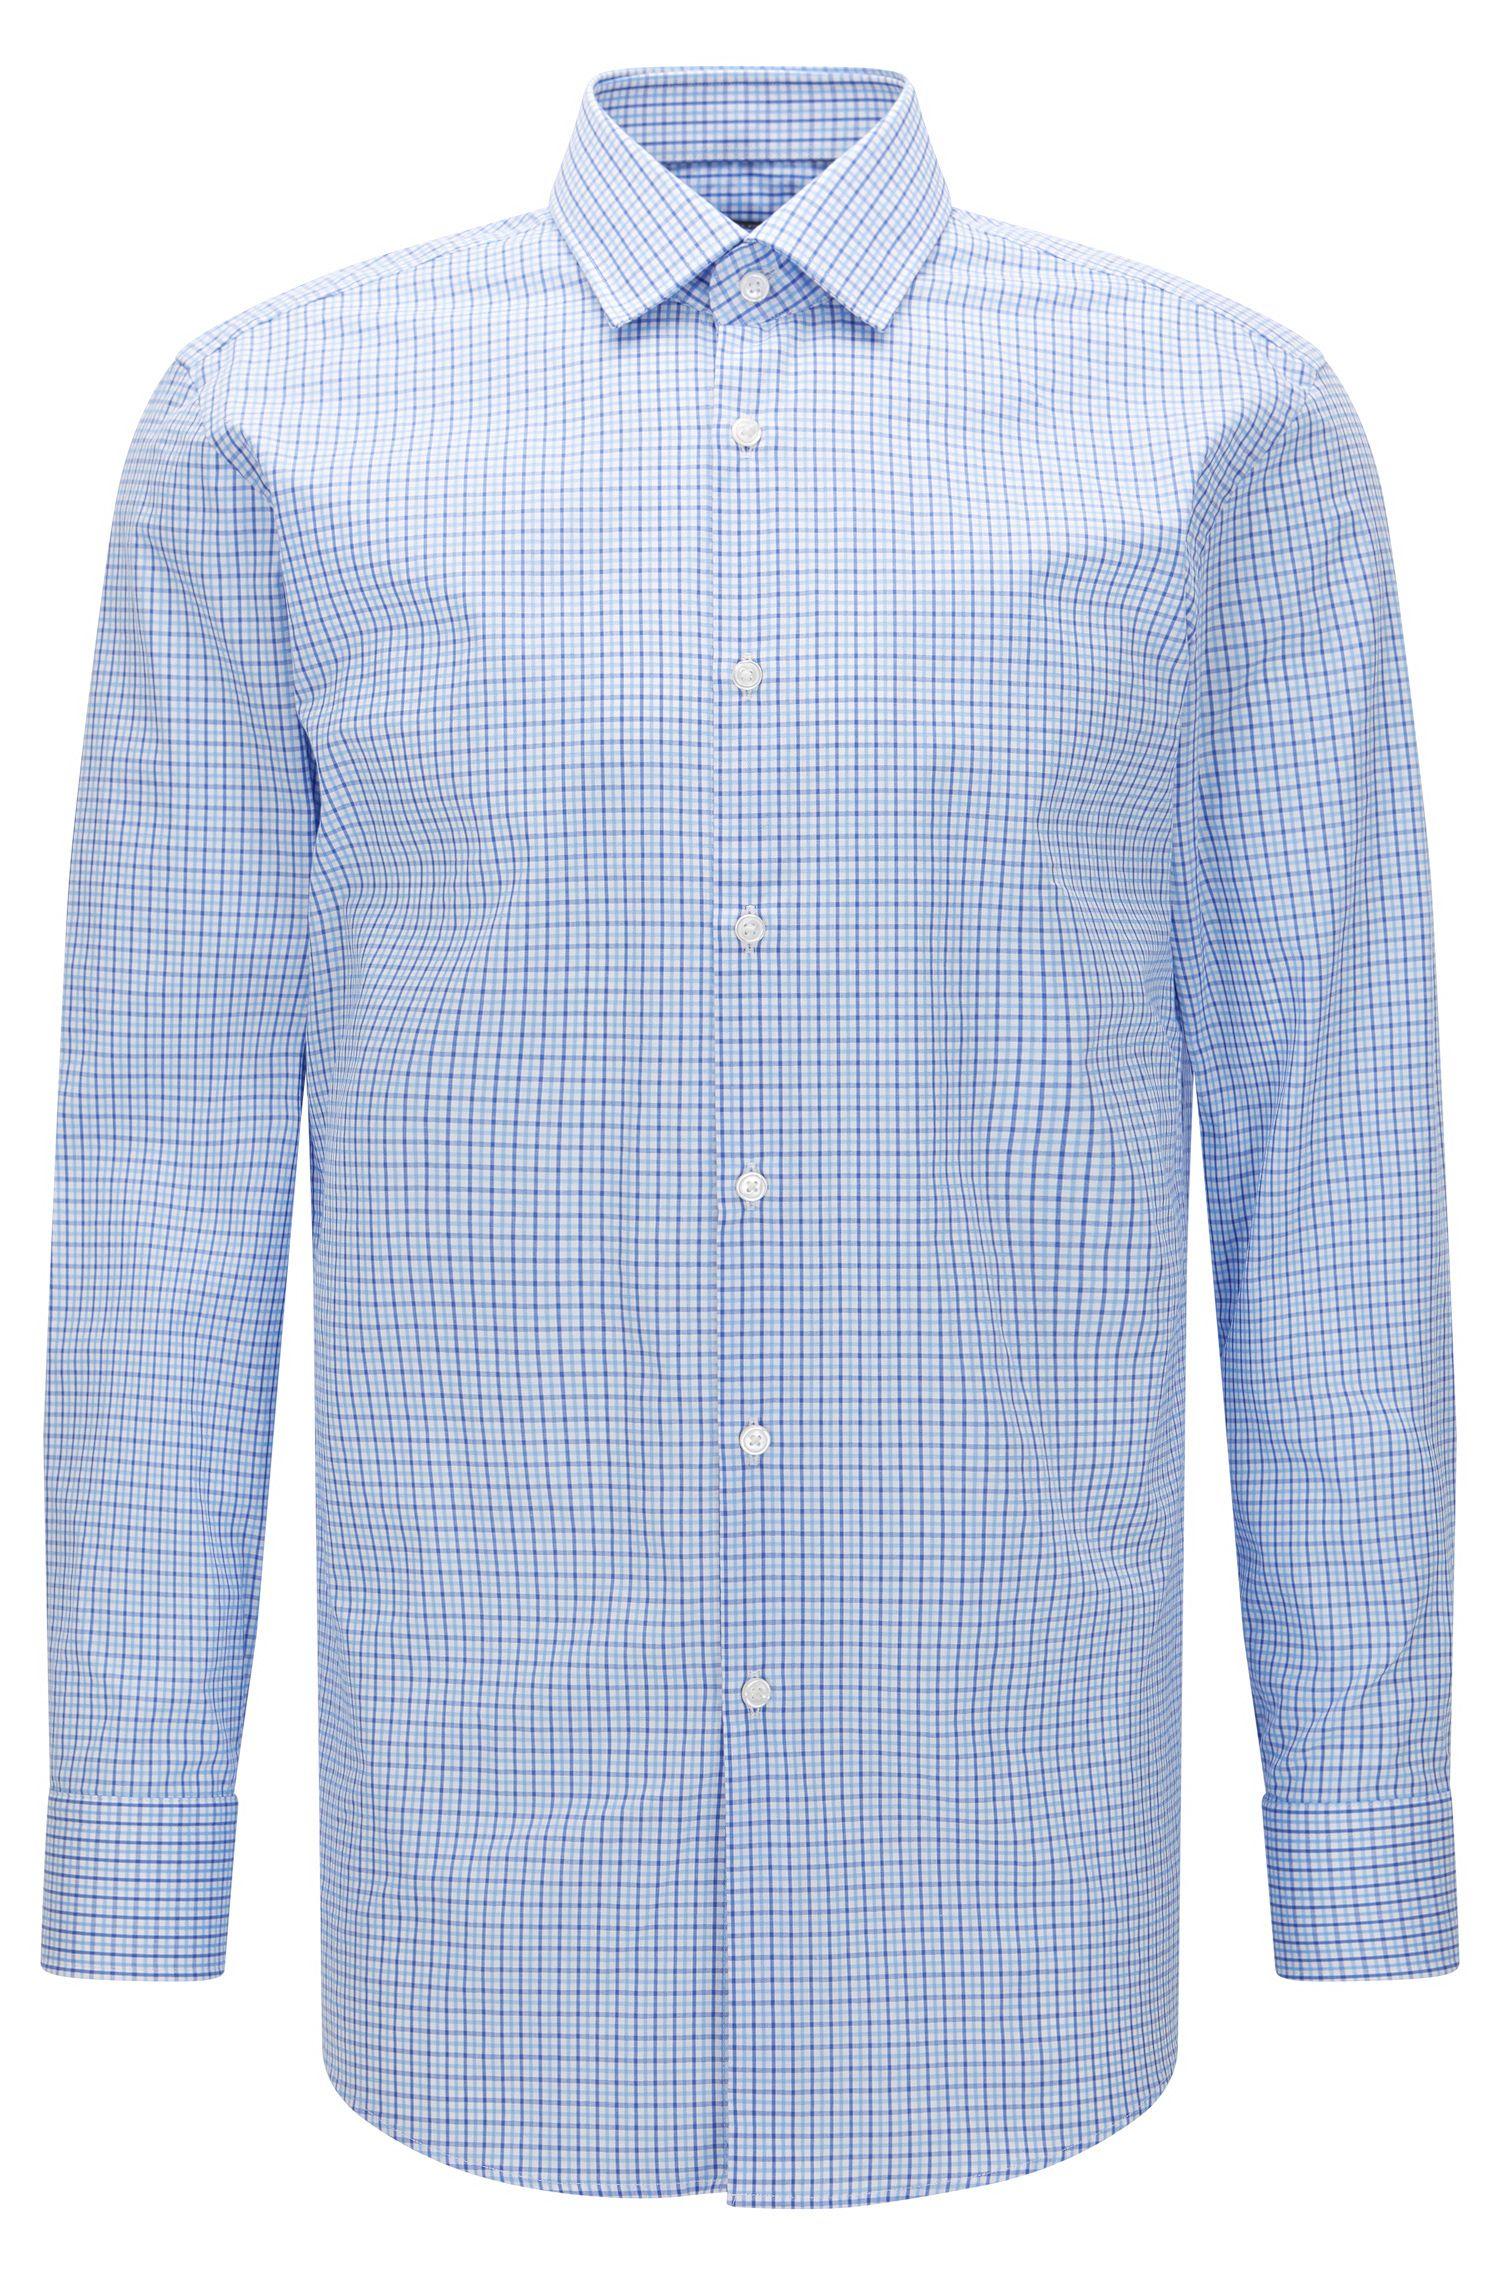 Tattersall Cotton Dress Shirt, Sharp Fit   Marley US